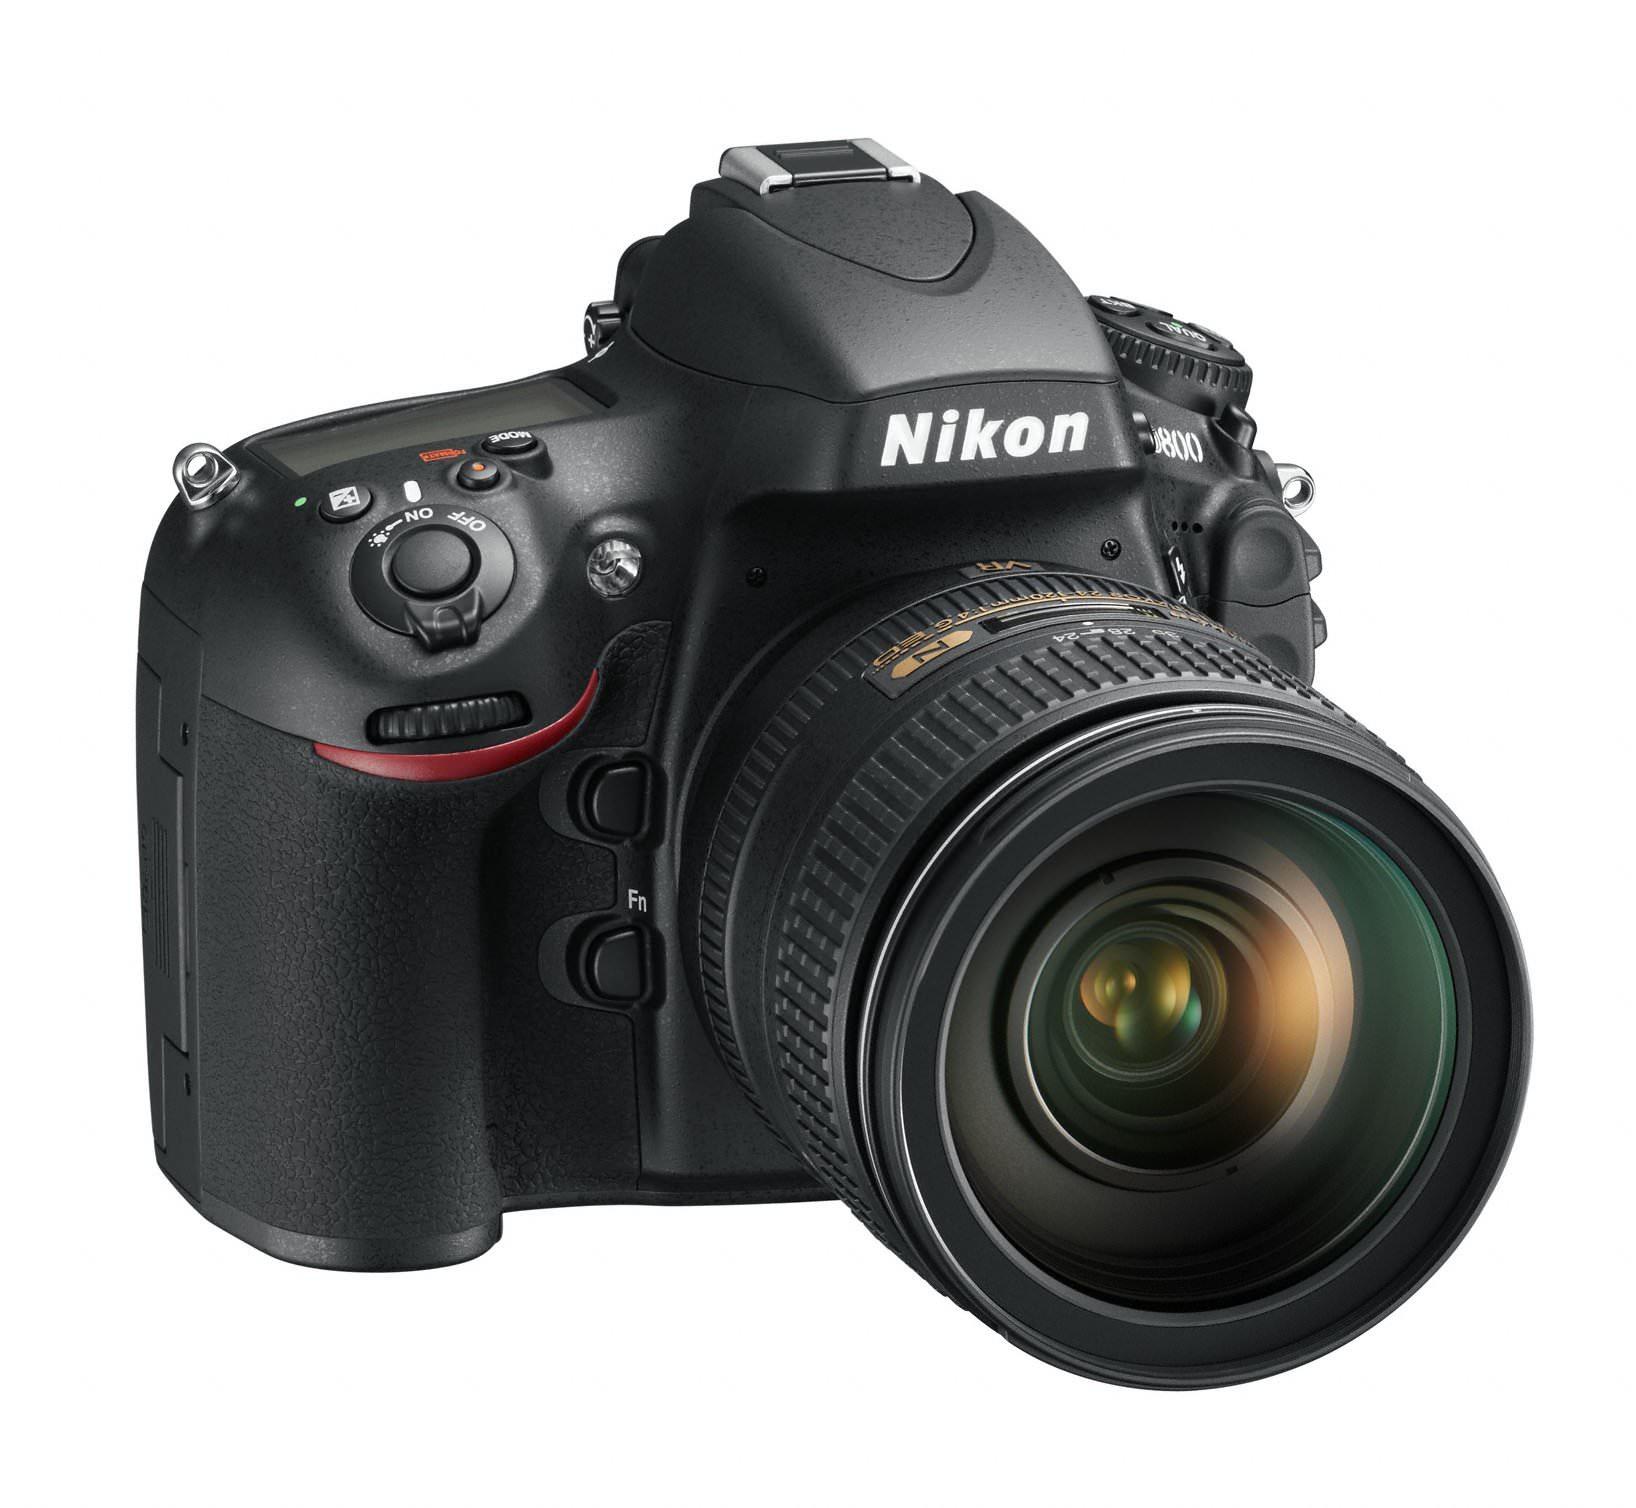 Nikon Wins 2 EISA Awards